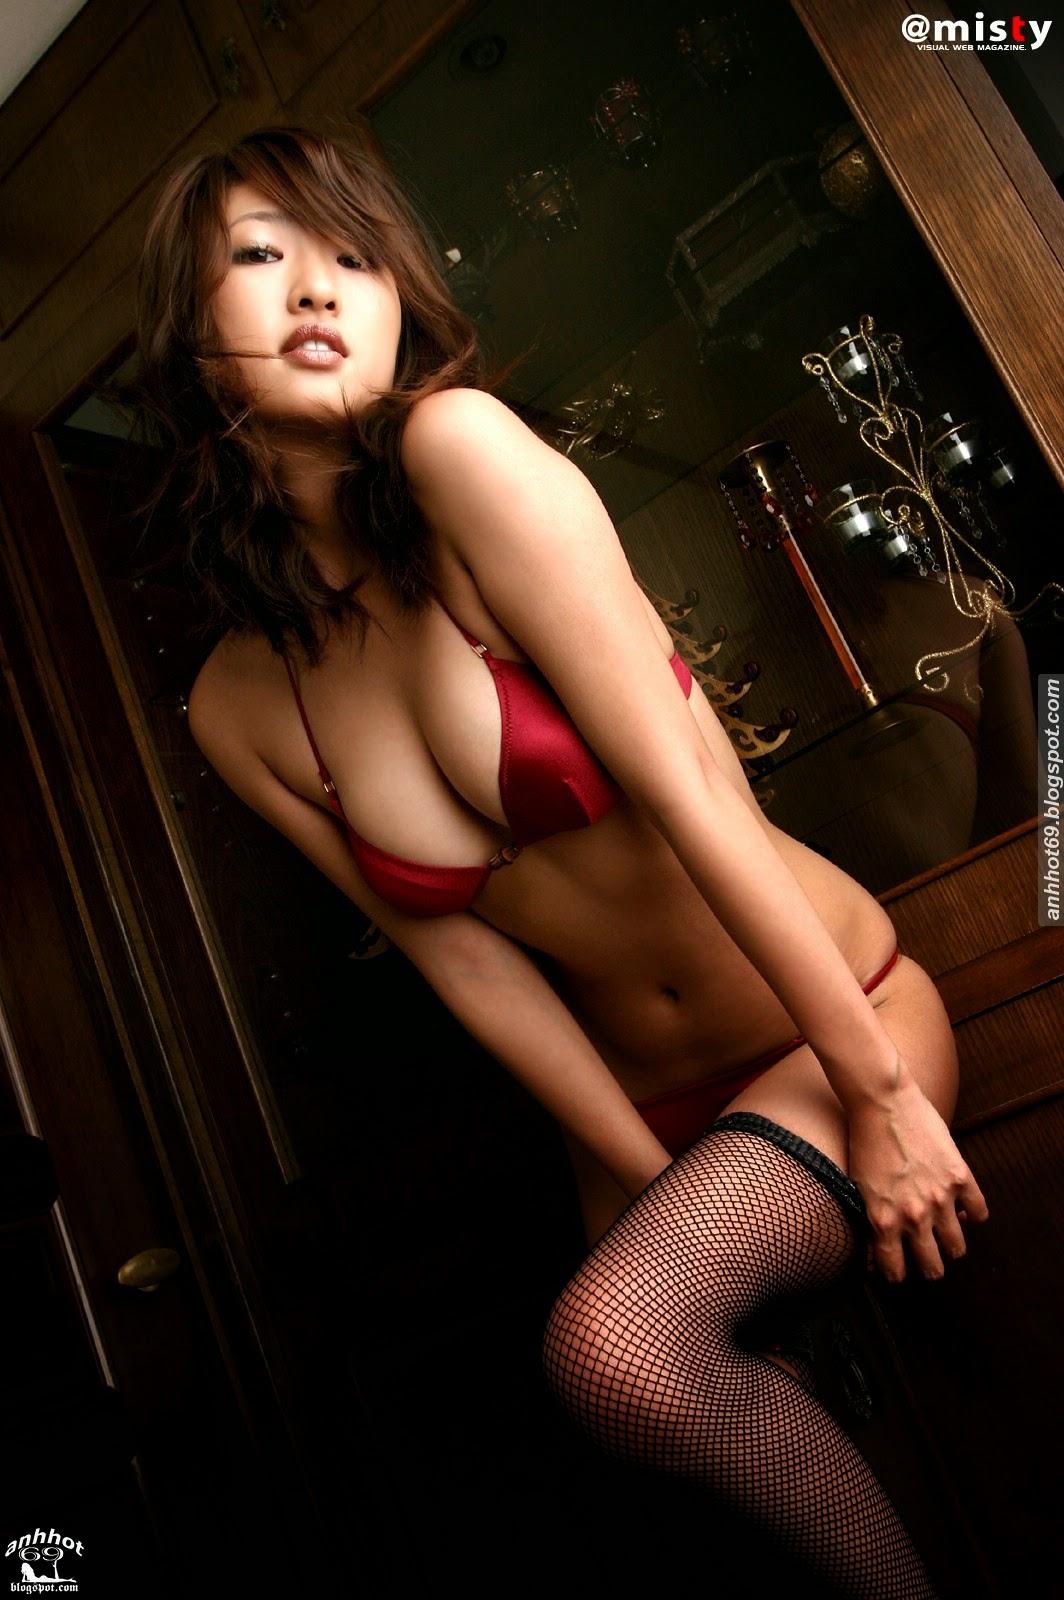 sayaka-ando-02013490